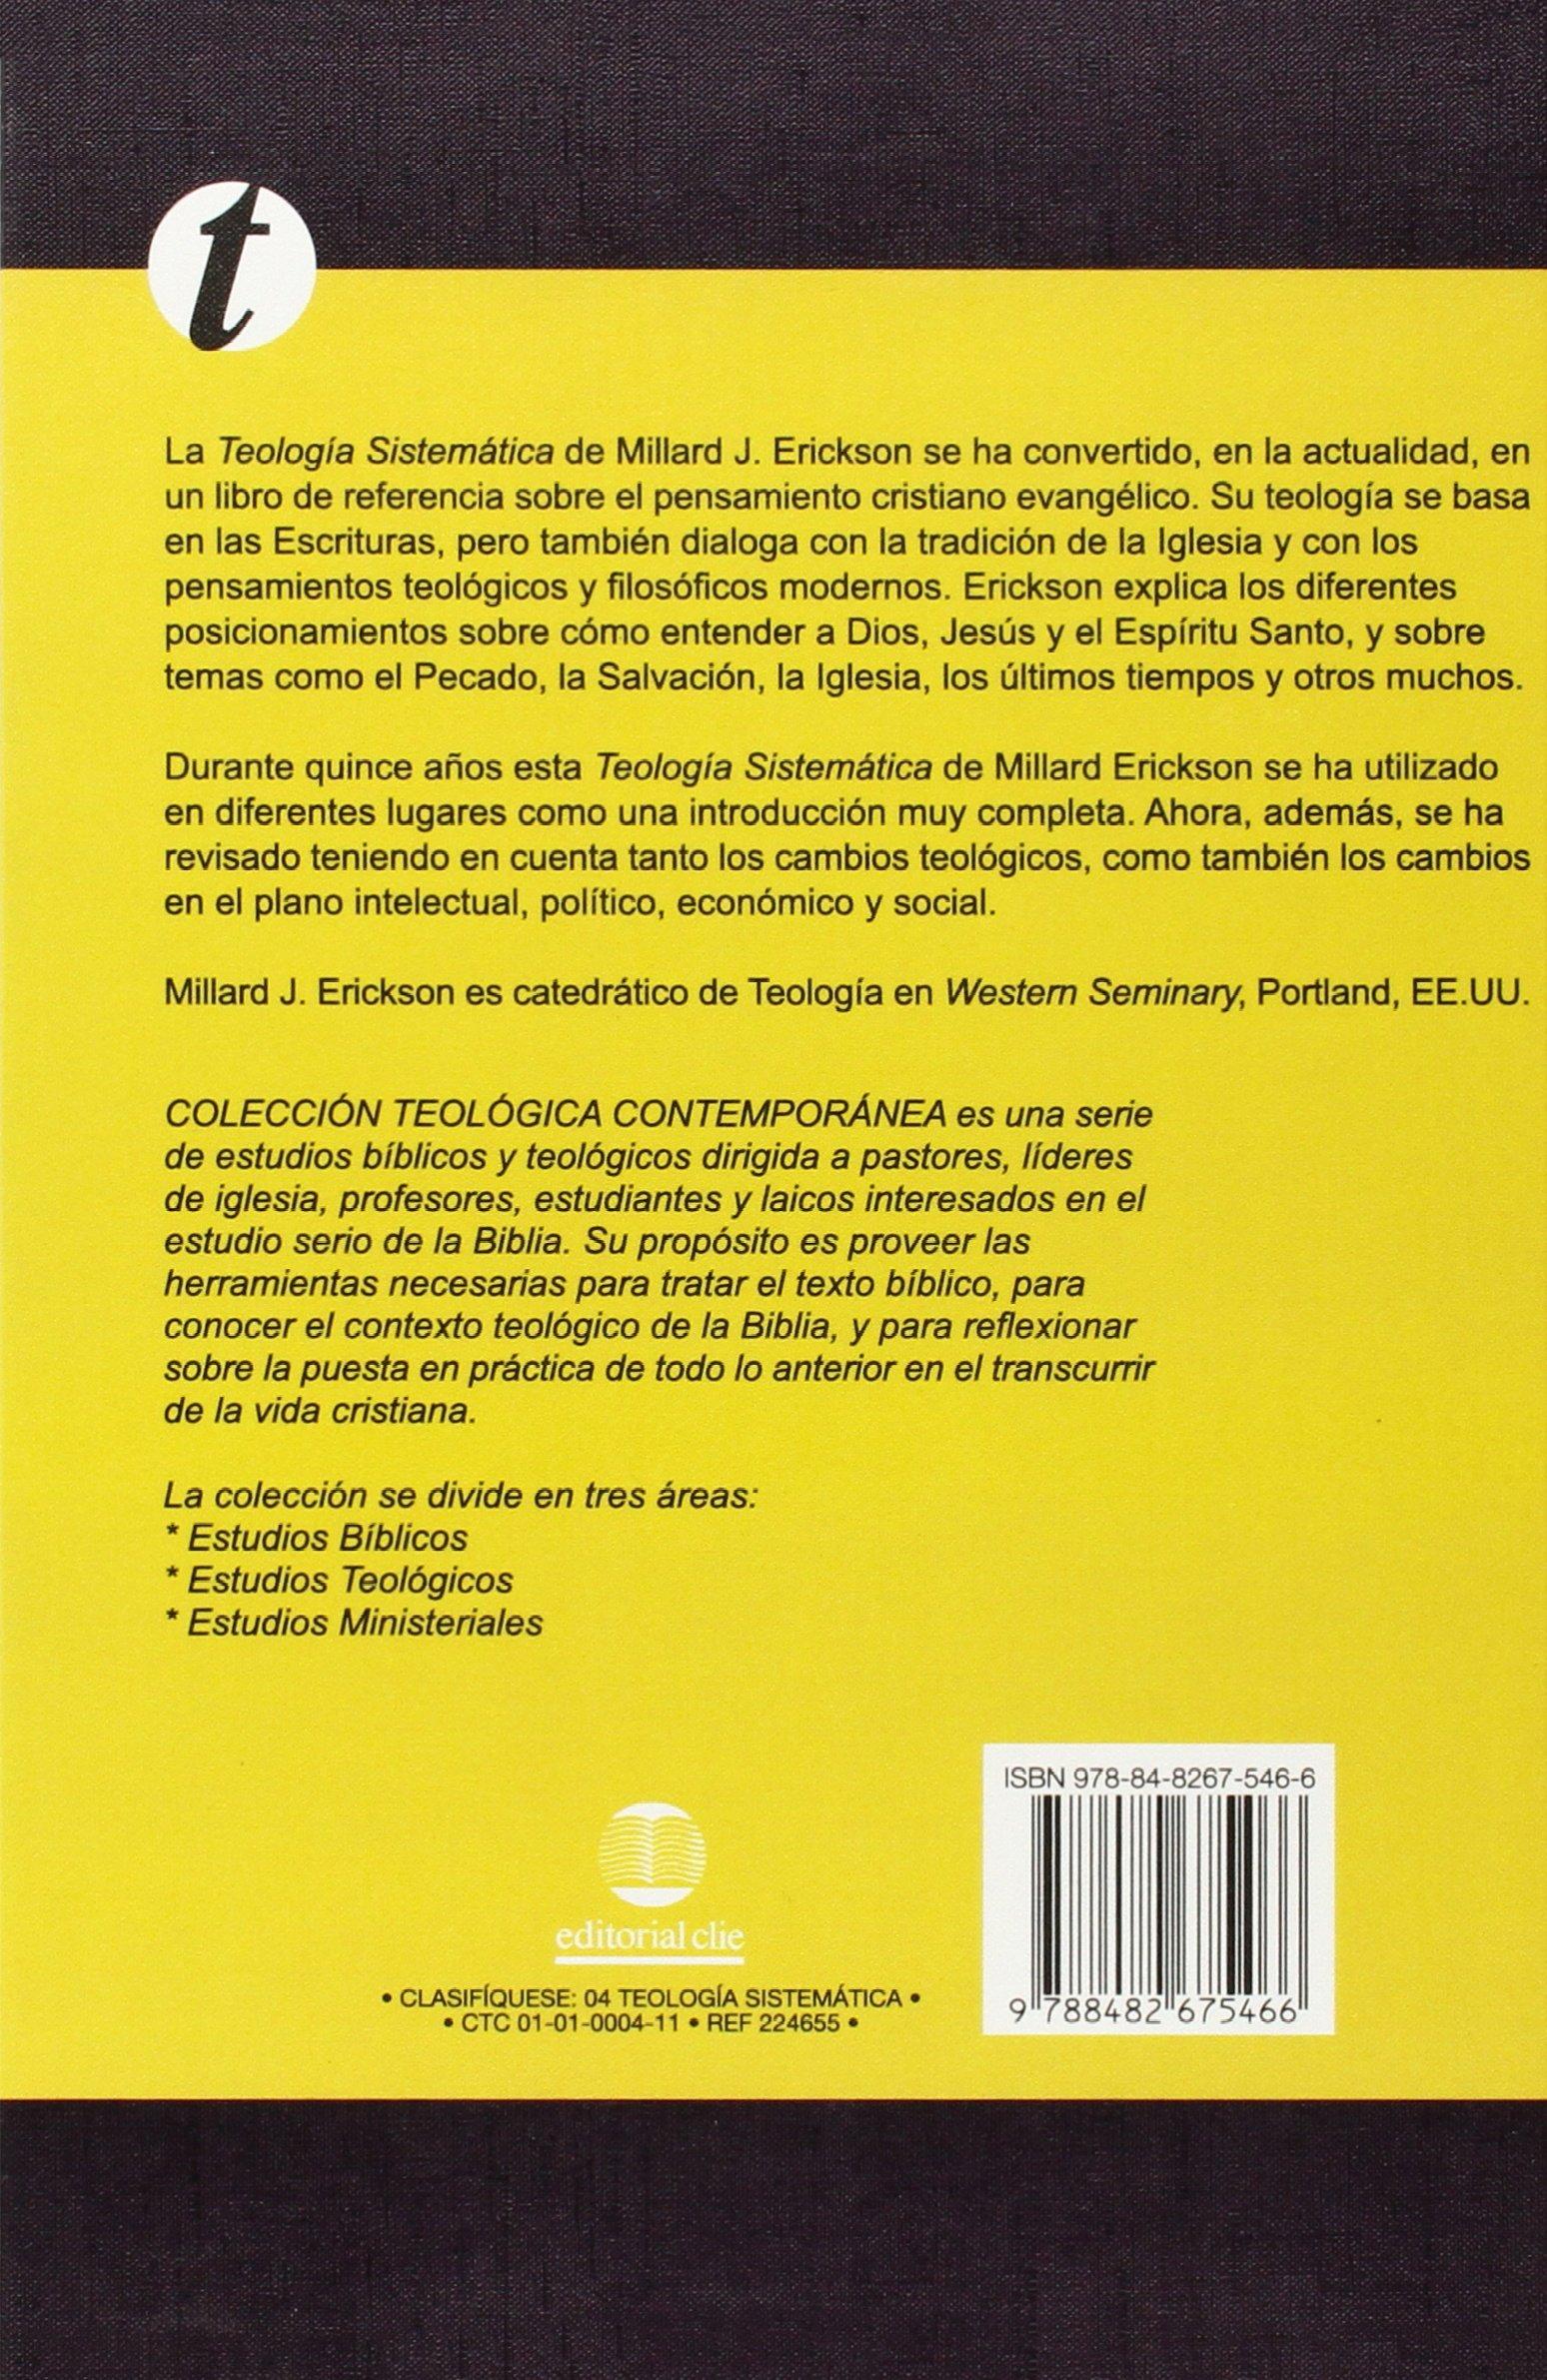 Teolog a sistem tica de erickson spanish edition millard j erickson 9788482675466 amazon com books